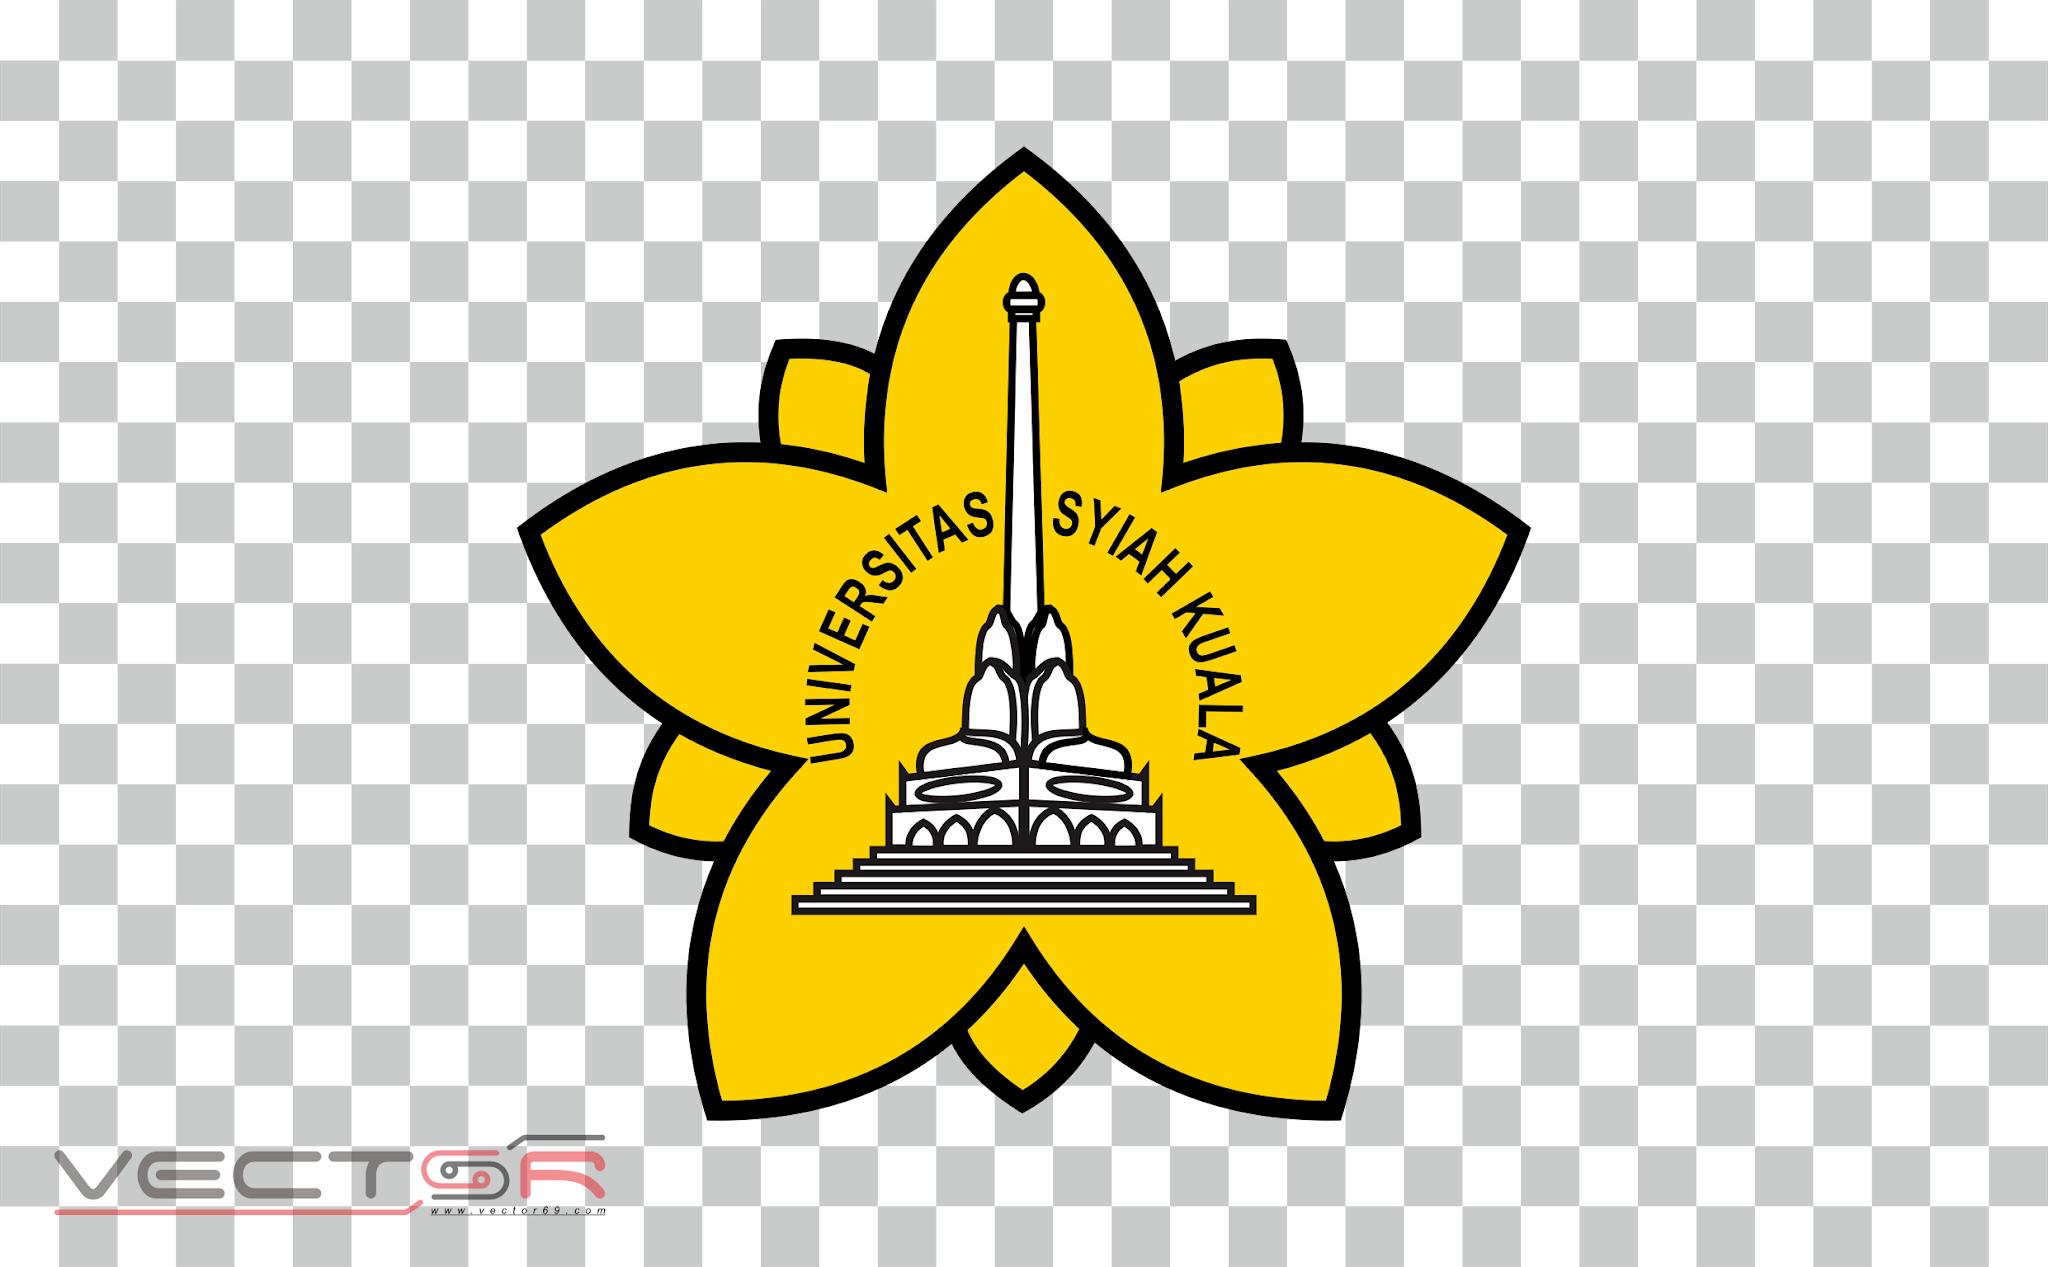 Logo Unsyiah (Universitas Syiah Kuala) - Download .PNG (Portable Network Graphics) Transparent Images